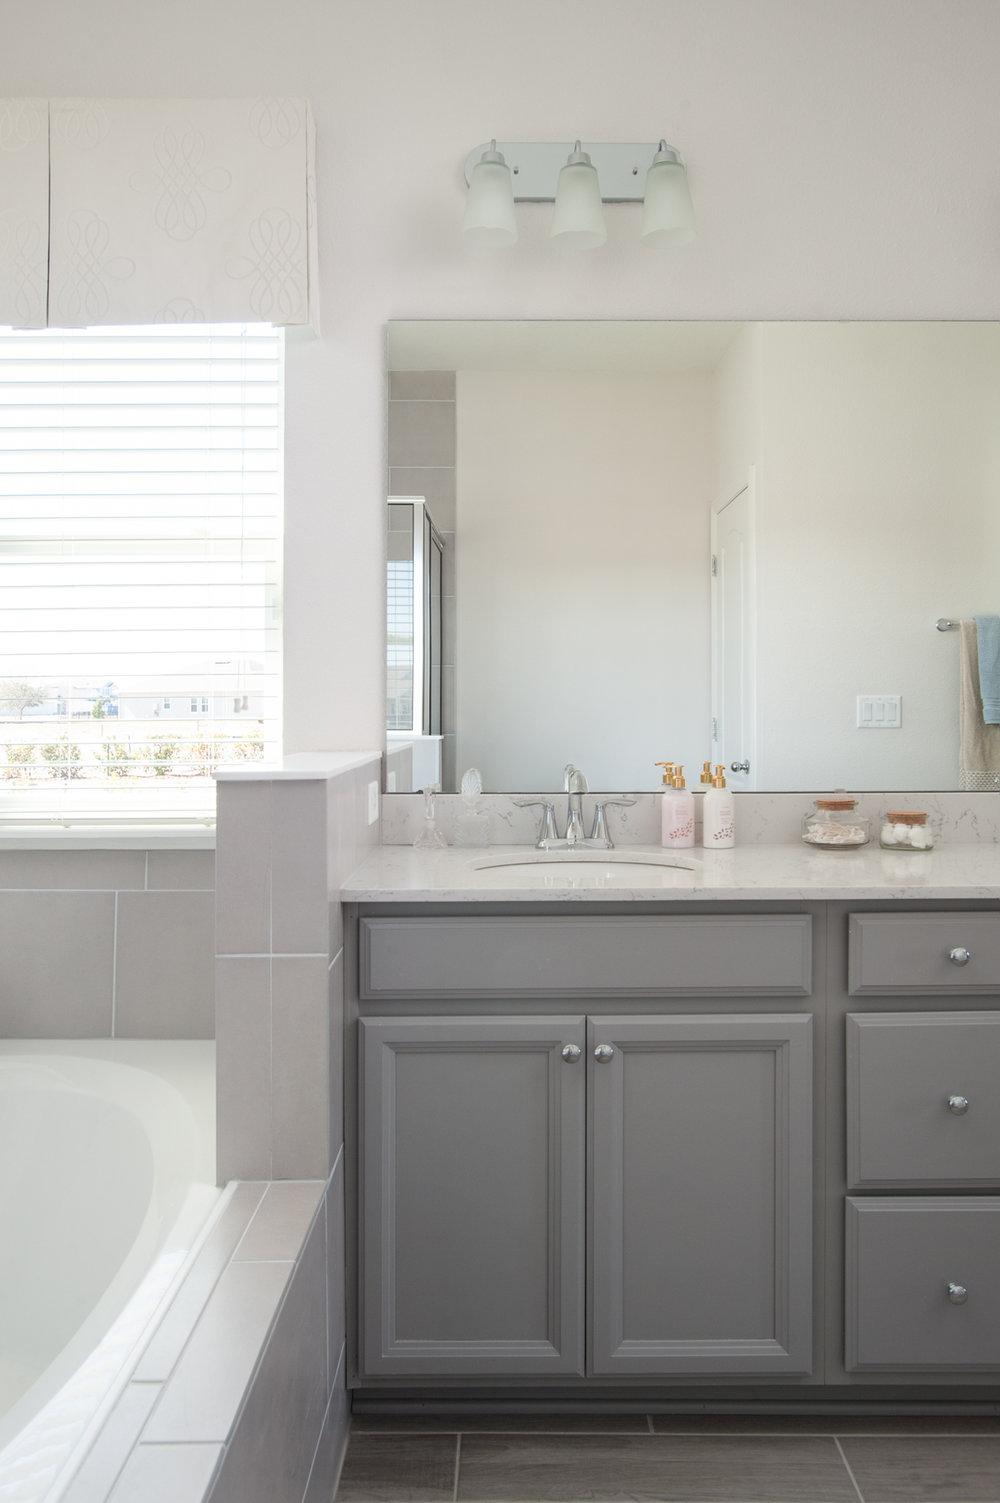 Micamy_Interior Designer_Design_Interior_Model_Merchandising_Owners_Suite_Universal_Furniture_Traditional_Transitional_Bathroom_Vanity_Grey_Cabinets_Bath.jpg